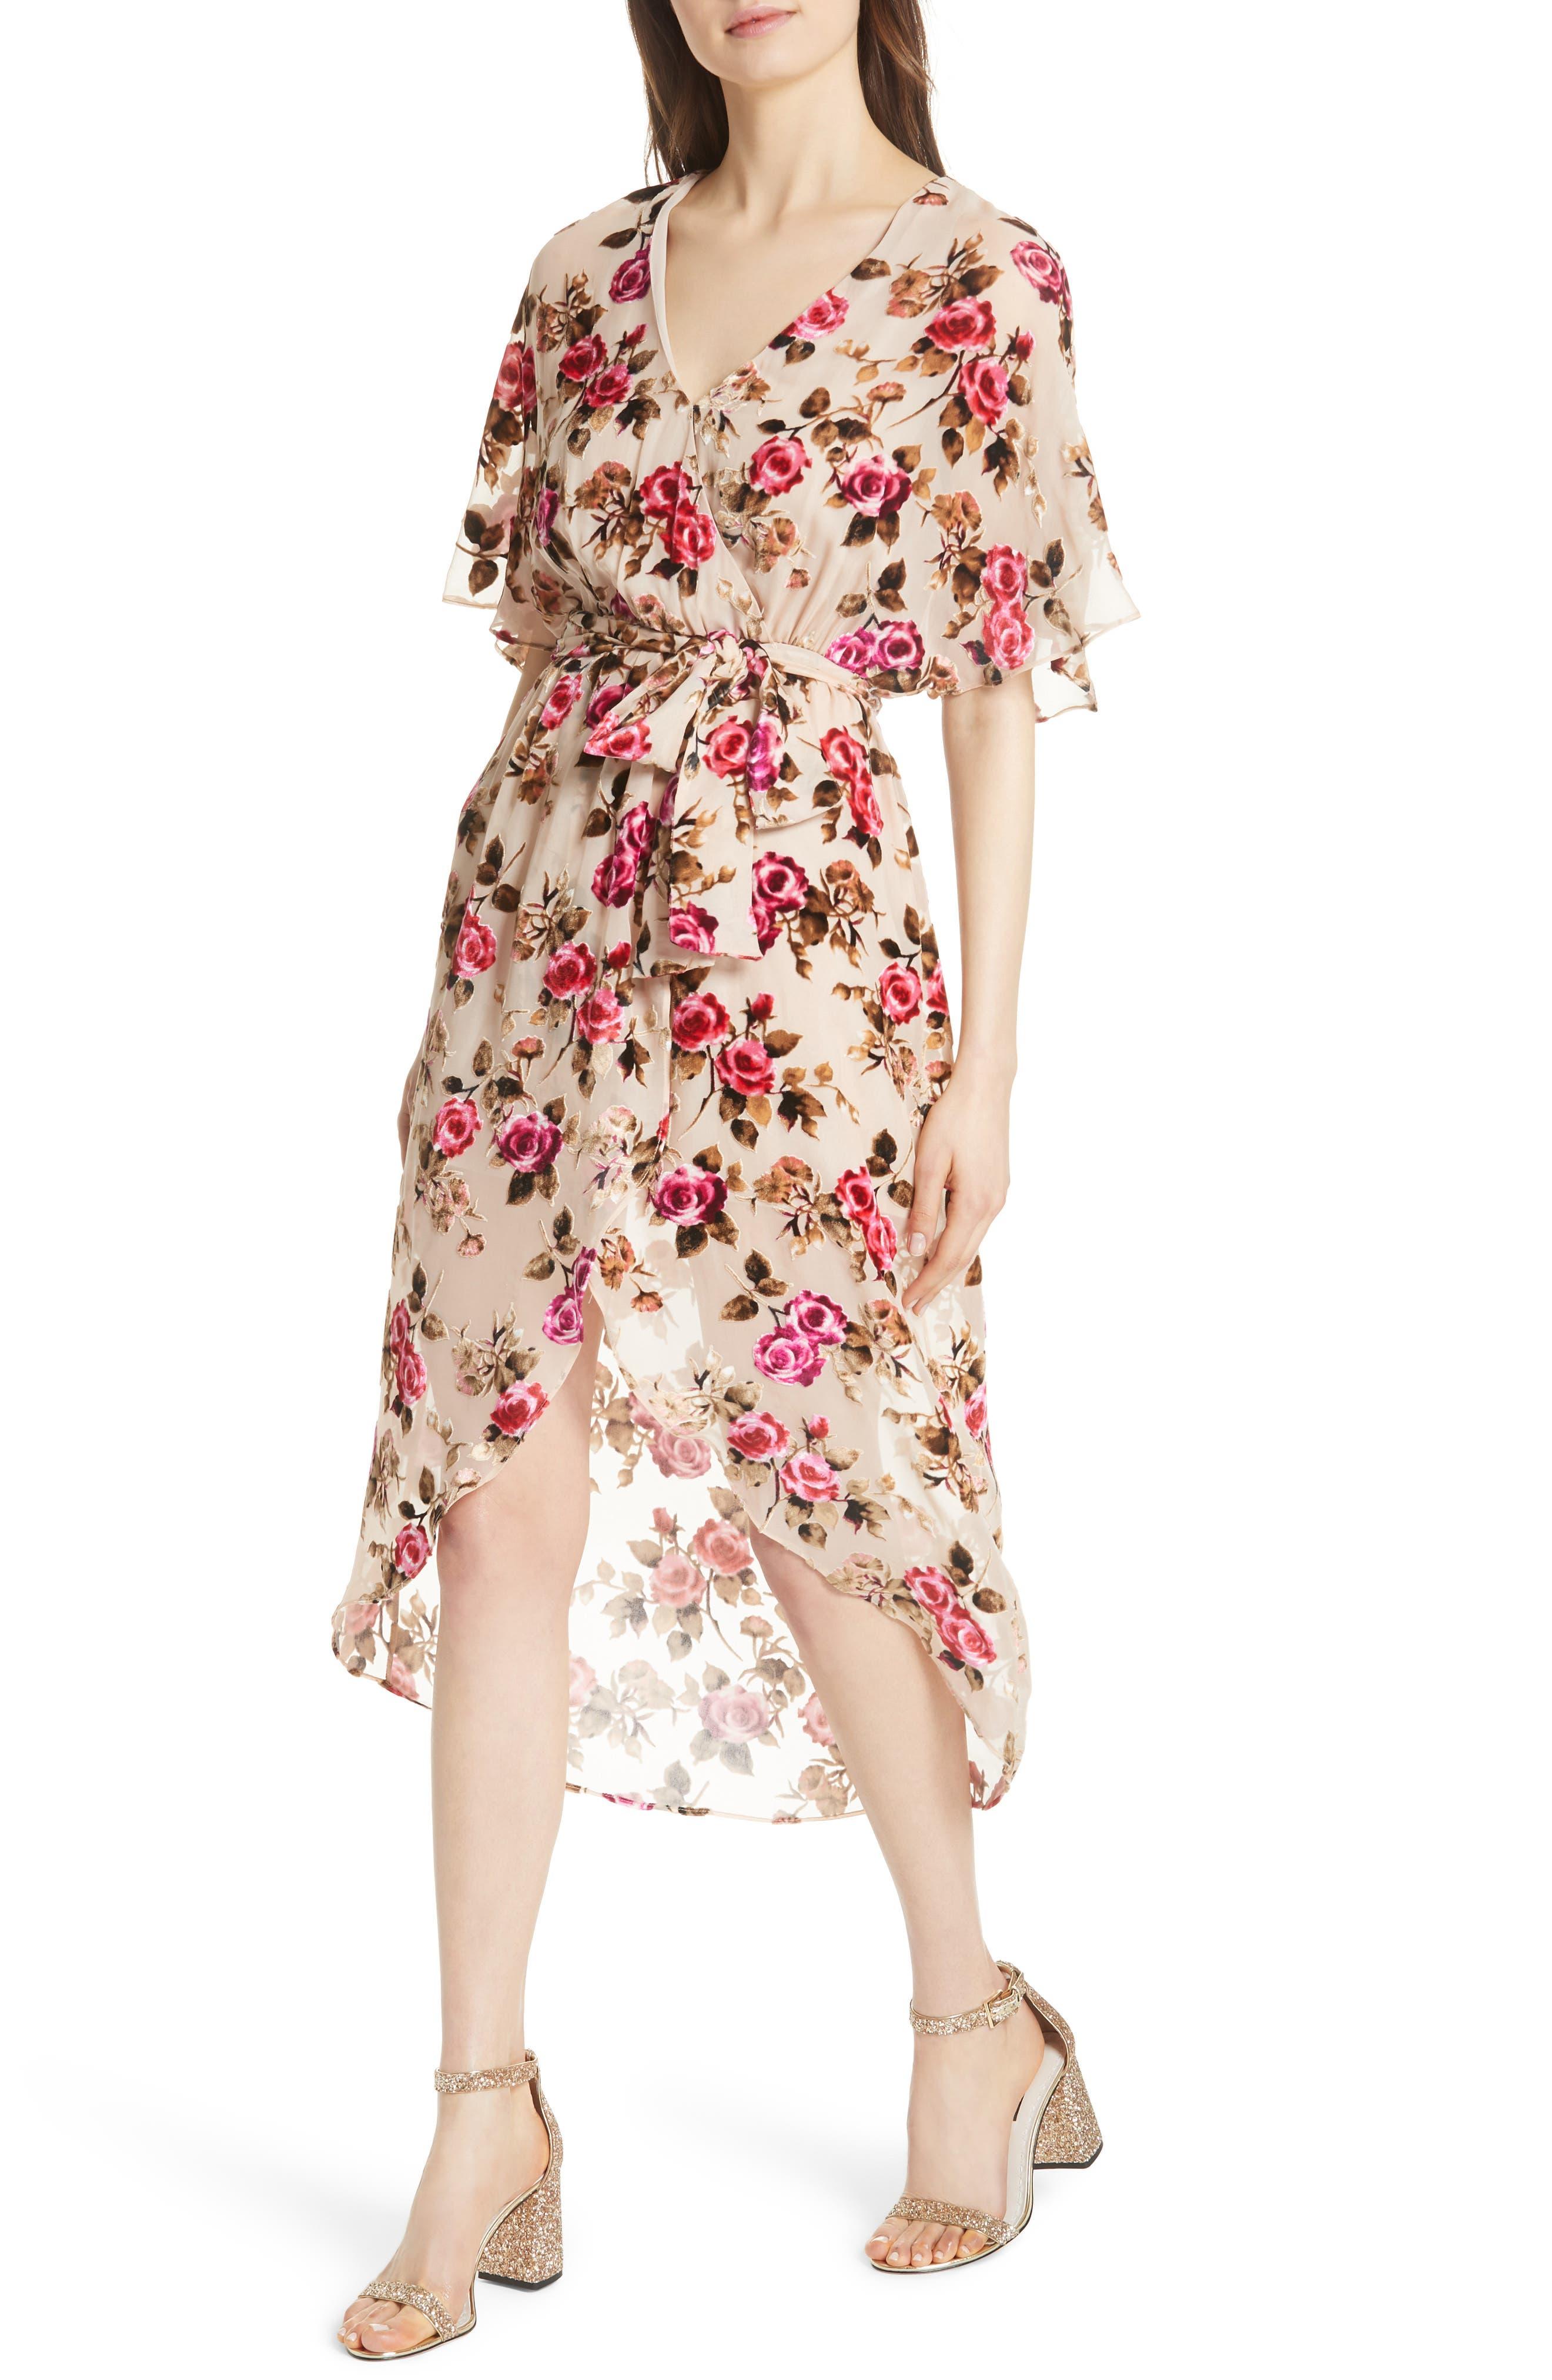 ALICE + OLIVIA,                             Clarine Floral Faux Wrap Dress,                             Alternate thumbnail 5, color,                             251